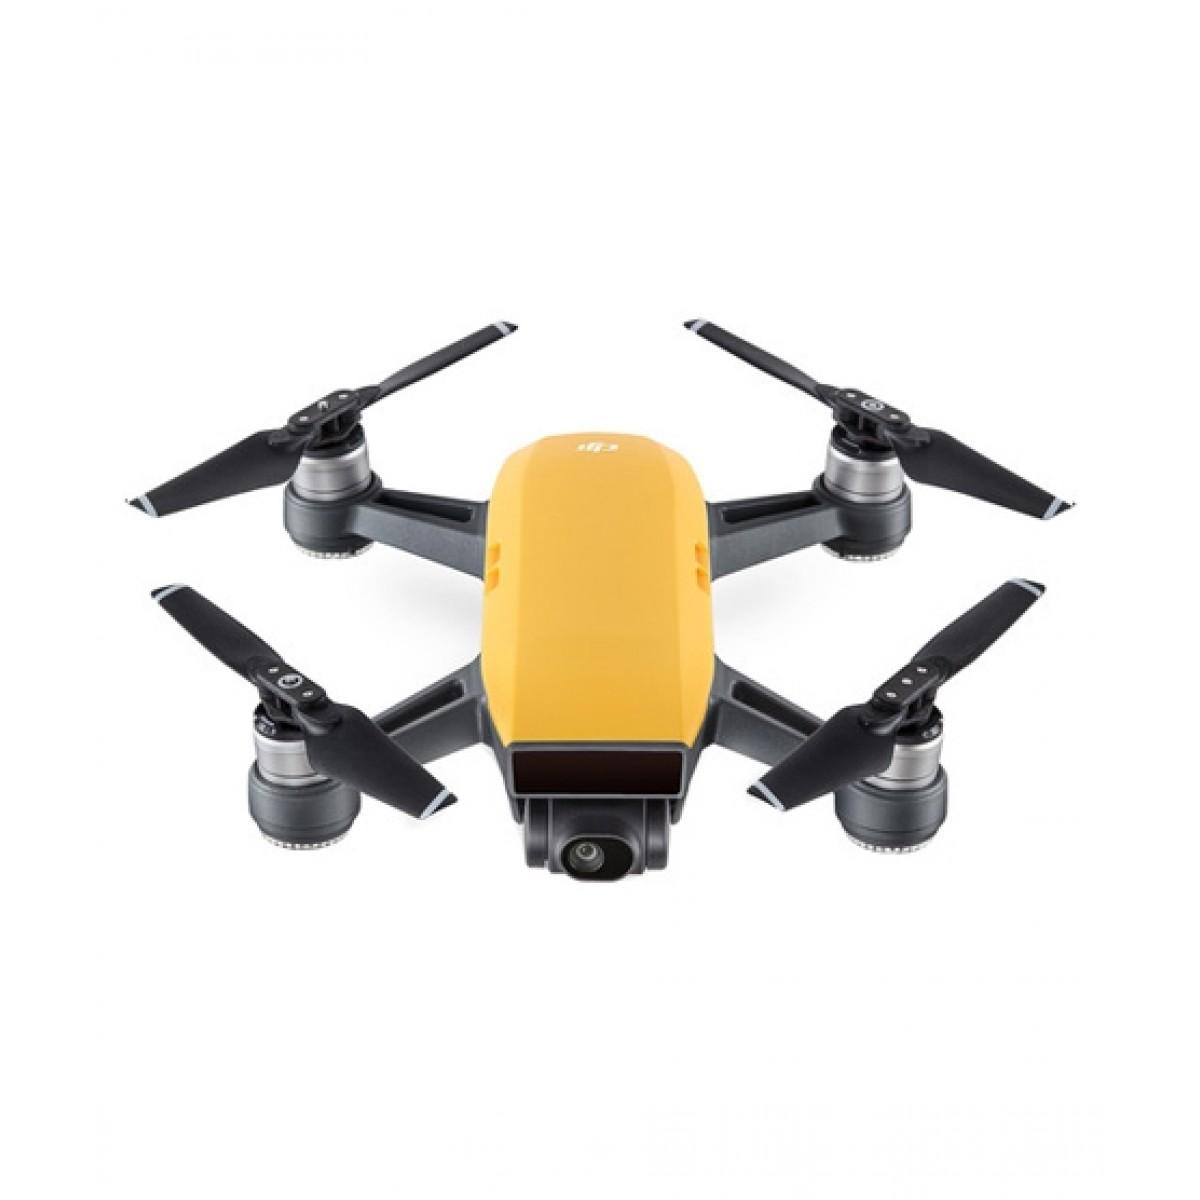 DJI Spark Quadcopter Sunrise Yellow